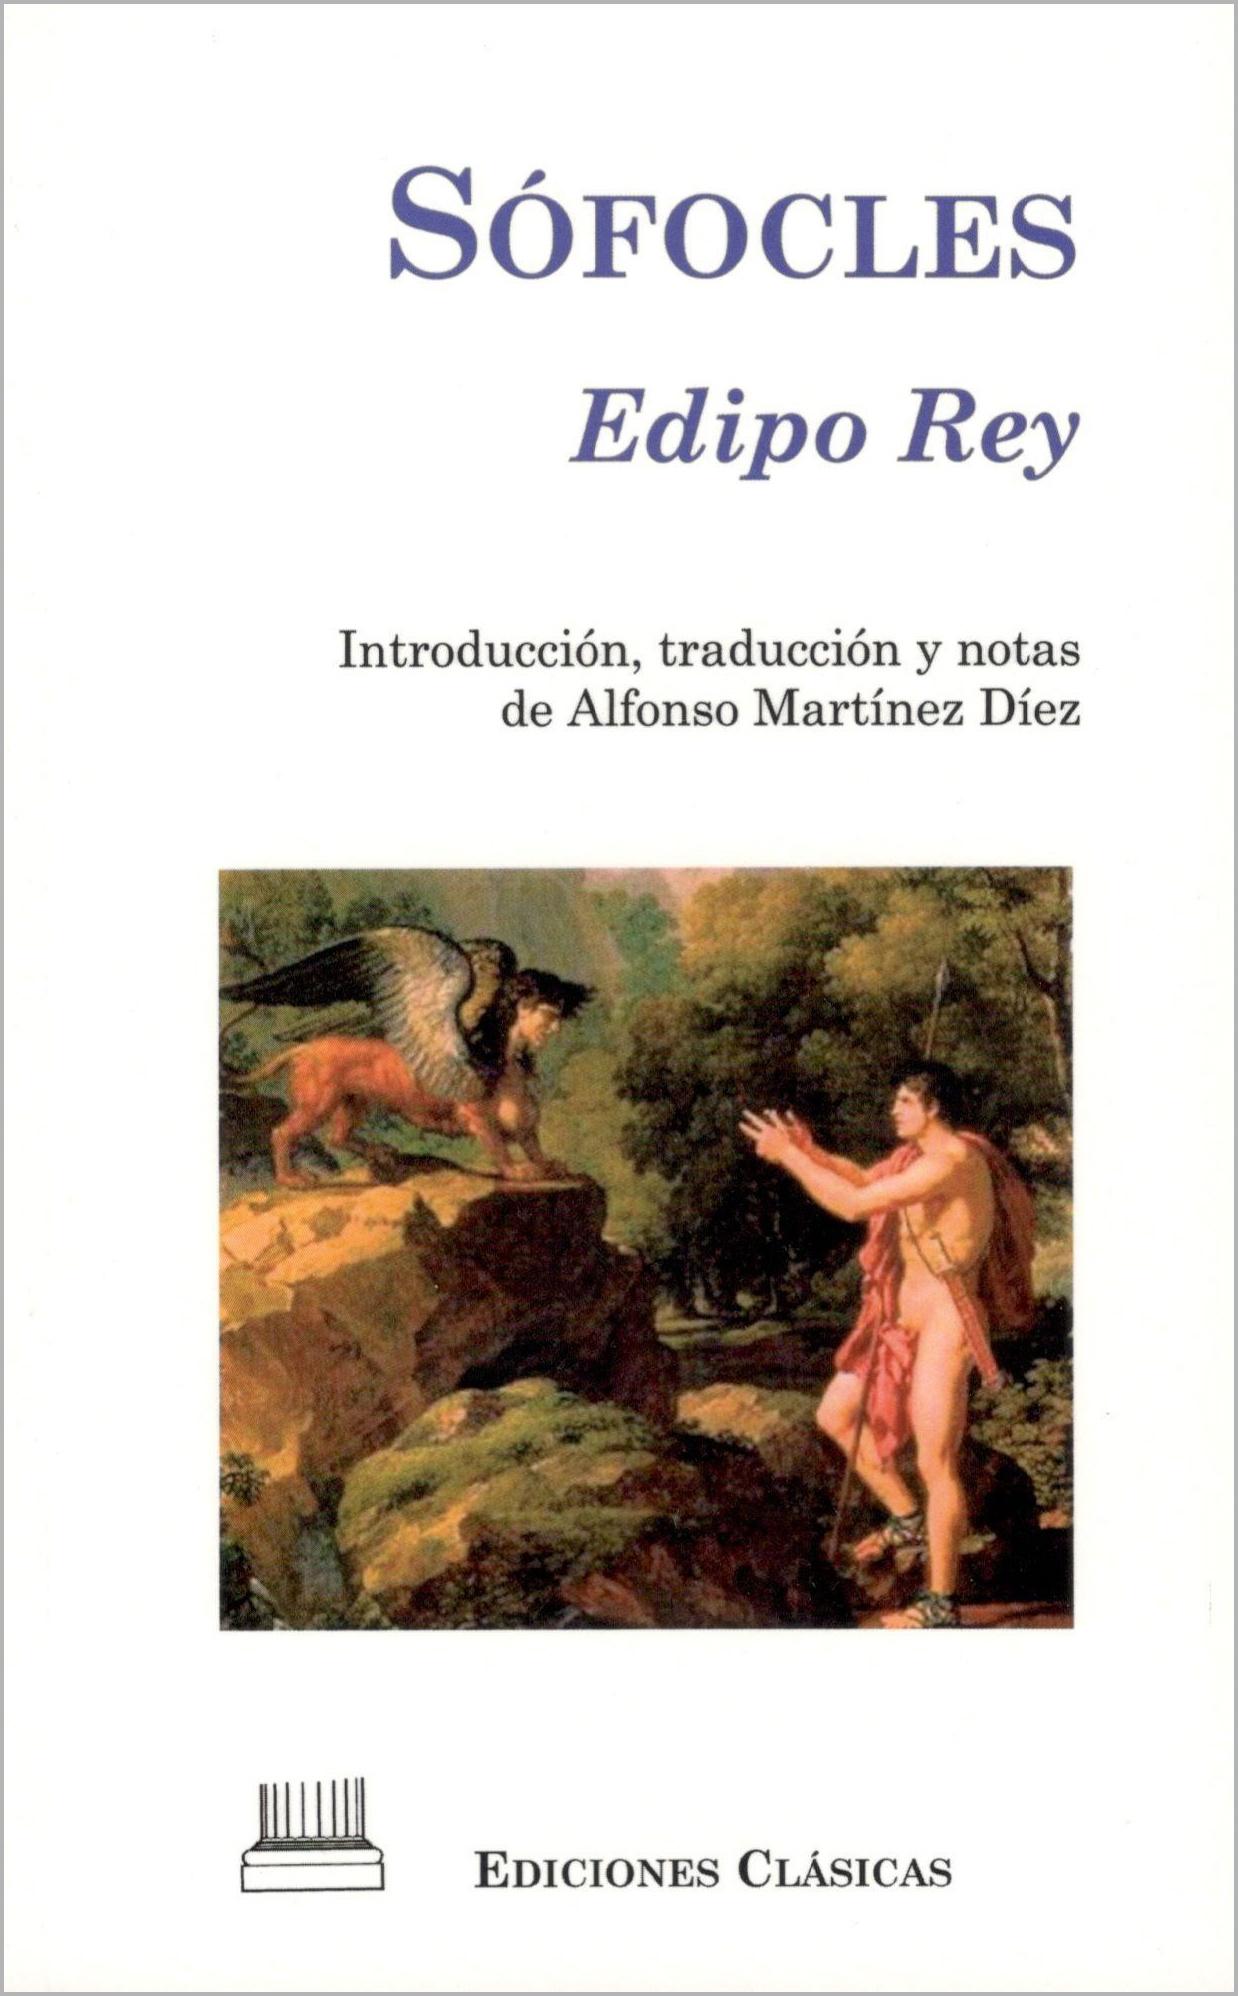 SÓFOCLES, EDIPO REY